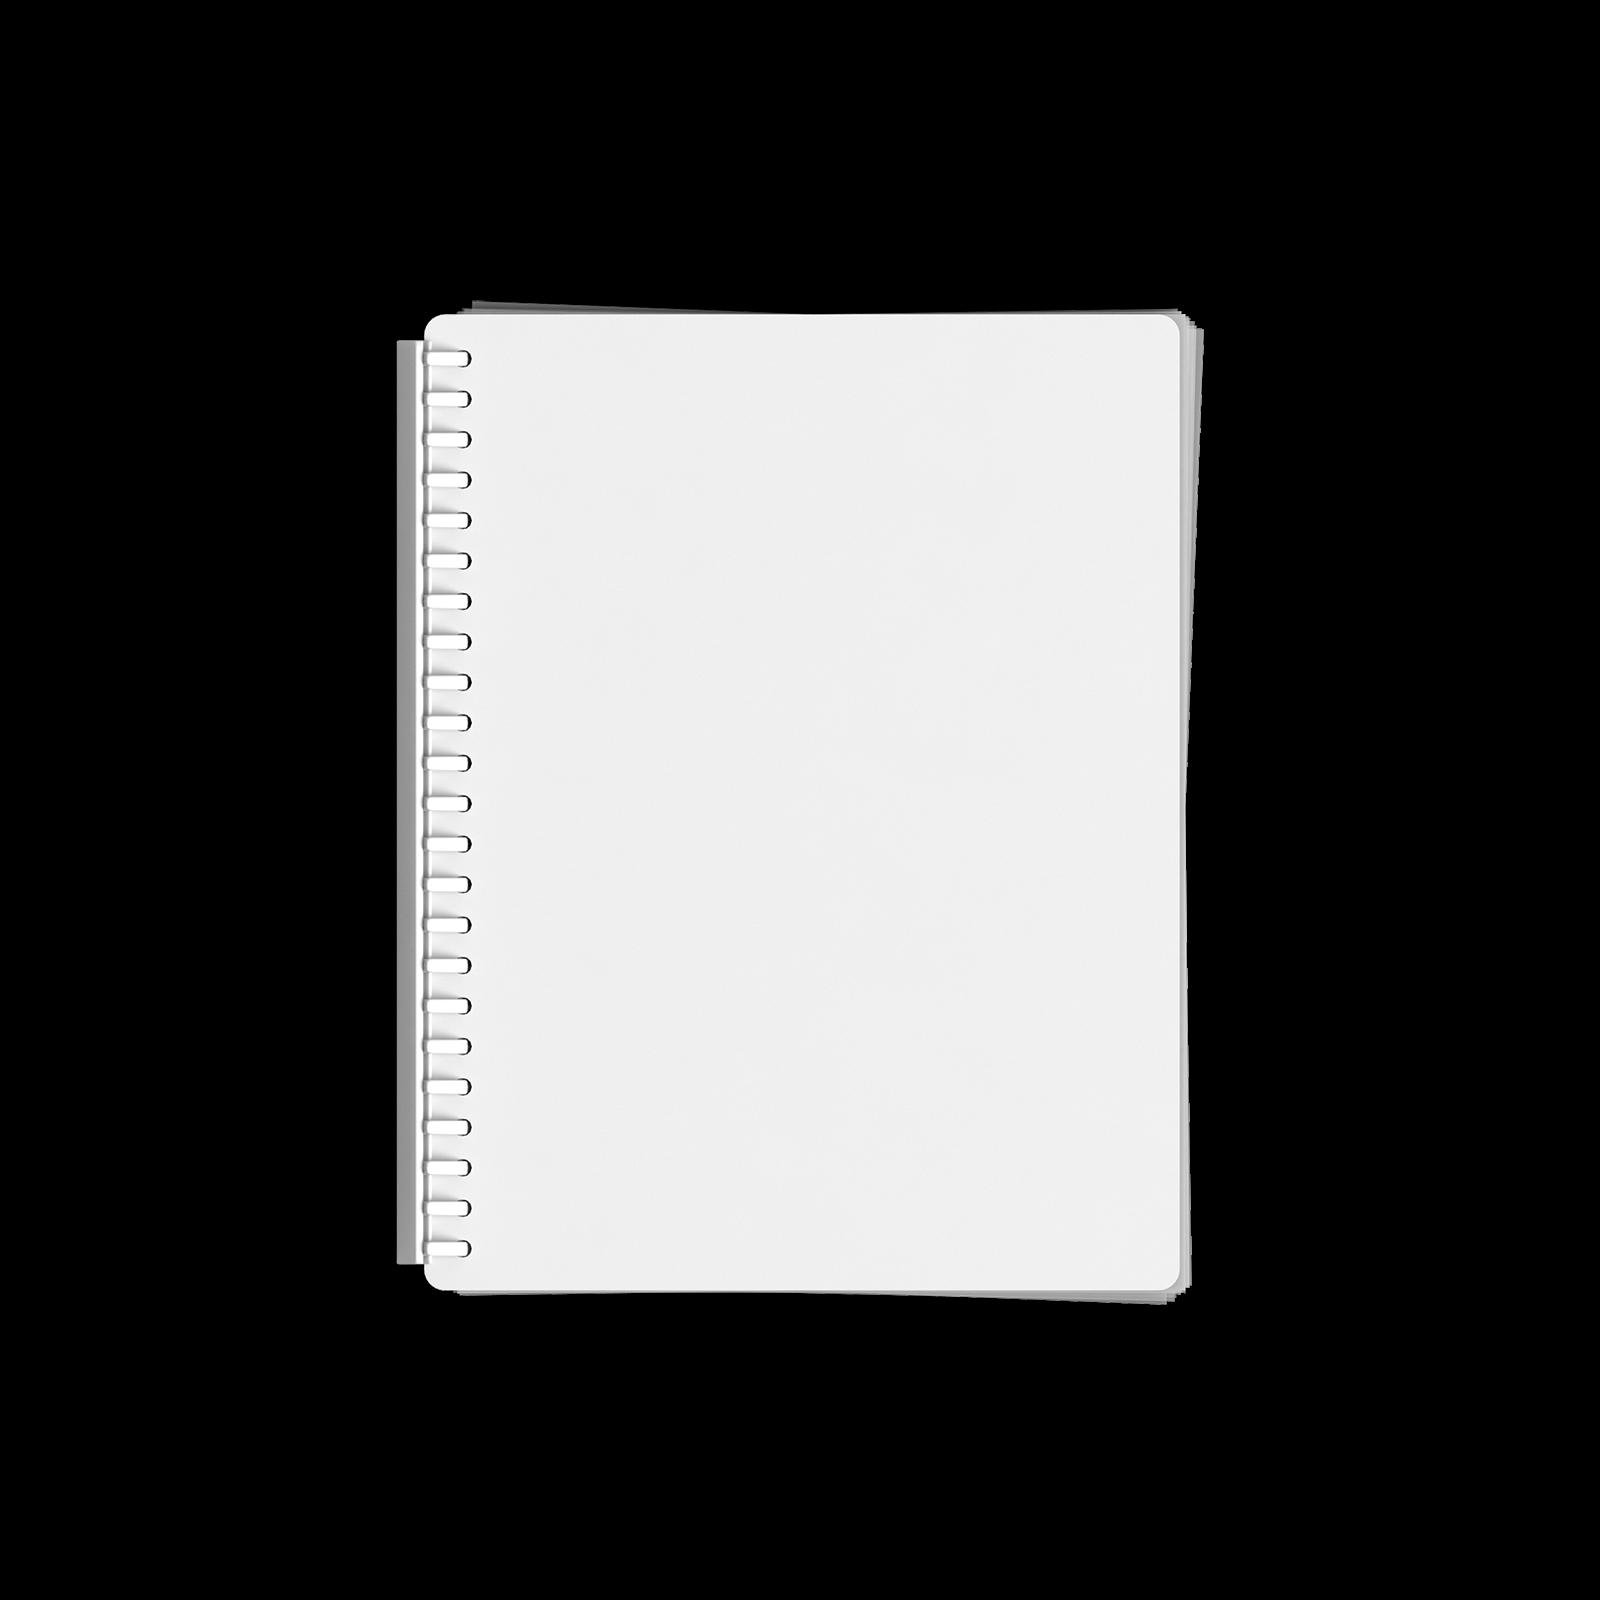 object_folder_1.png